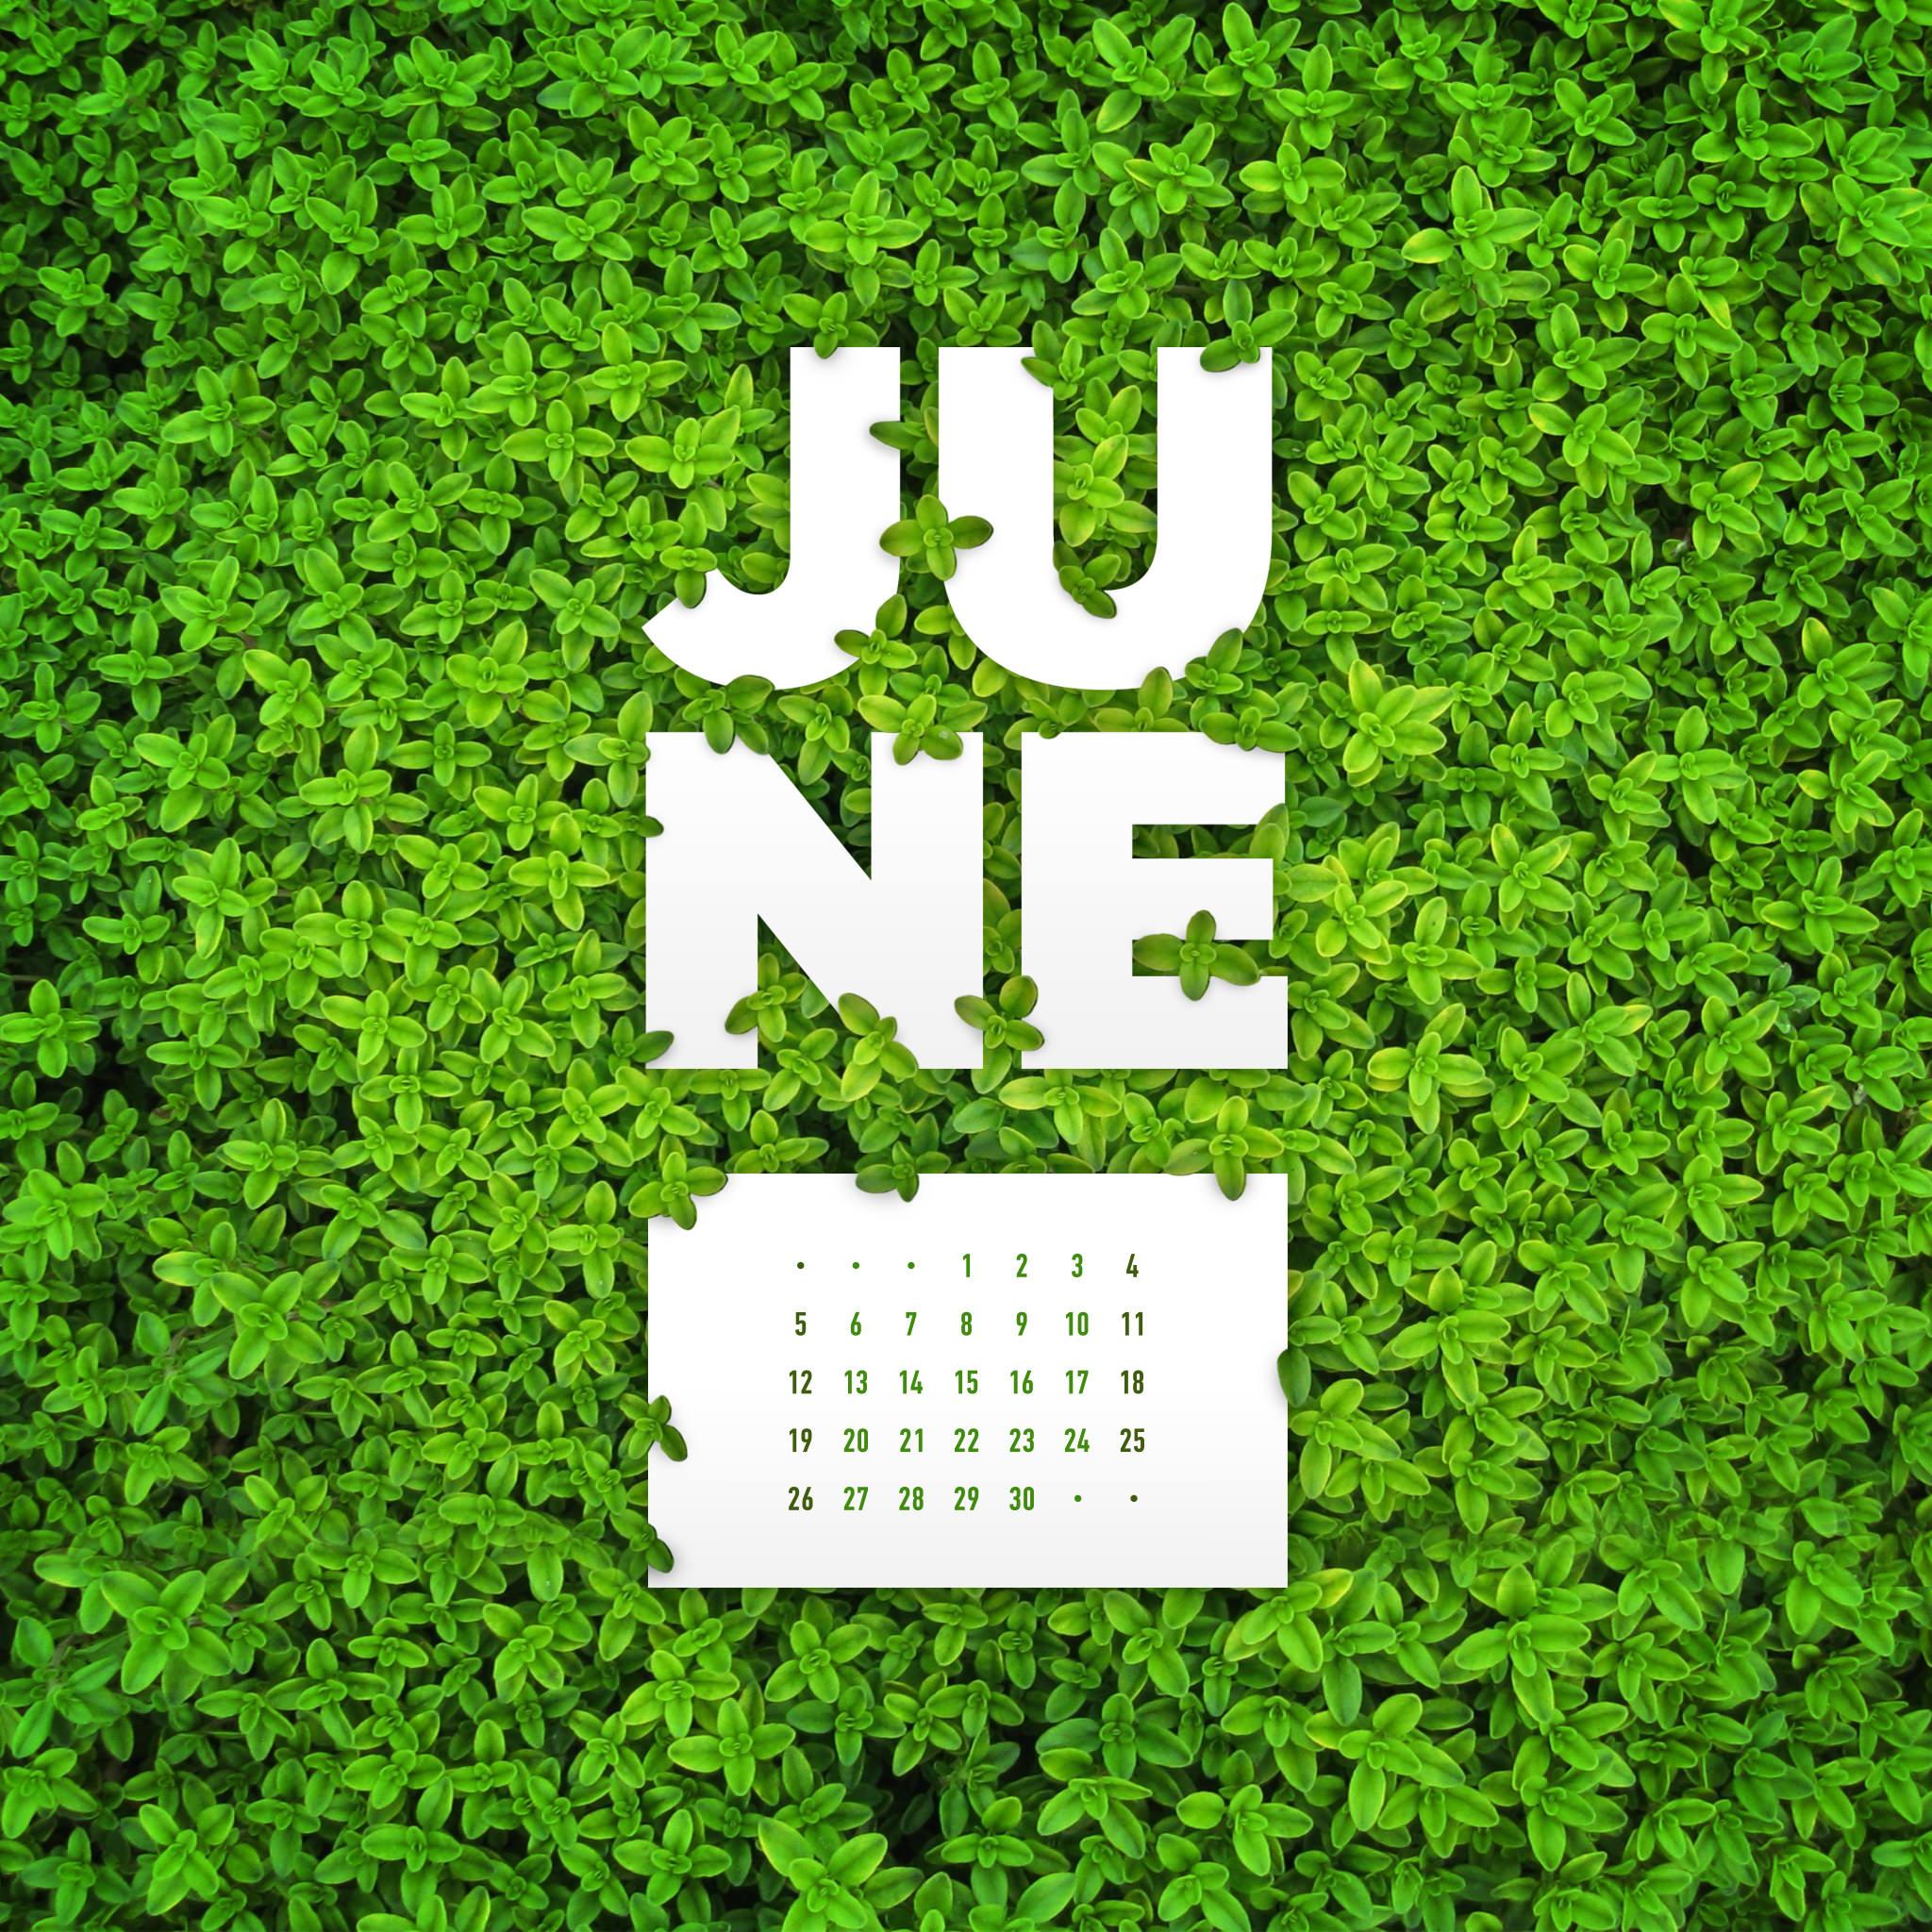 June 2016 Desktop Calendar Wallpaper Paper Leaf 2048x2048